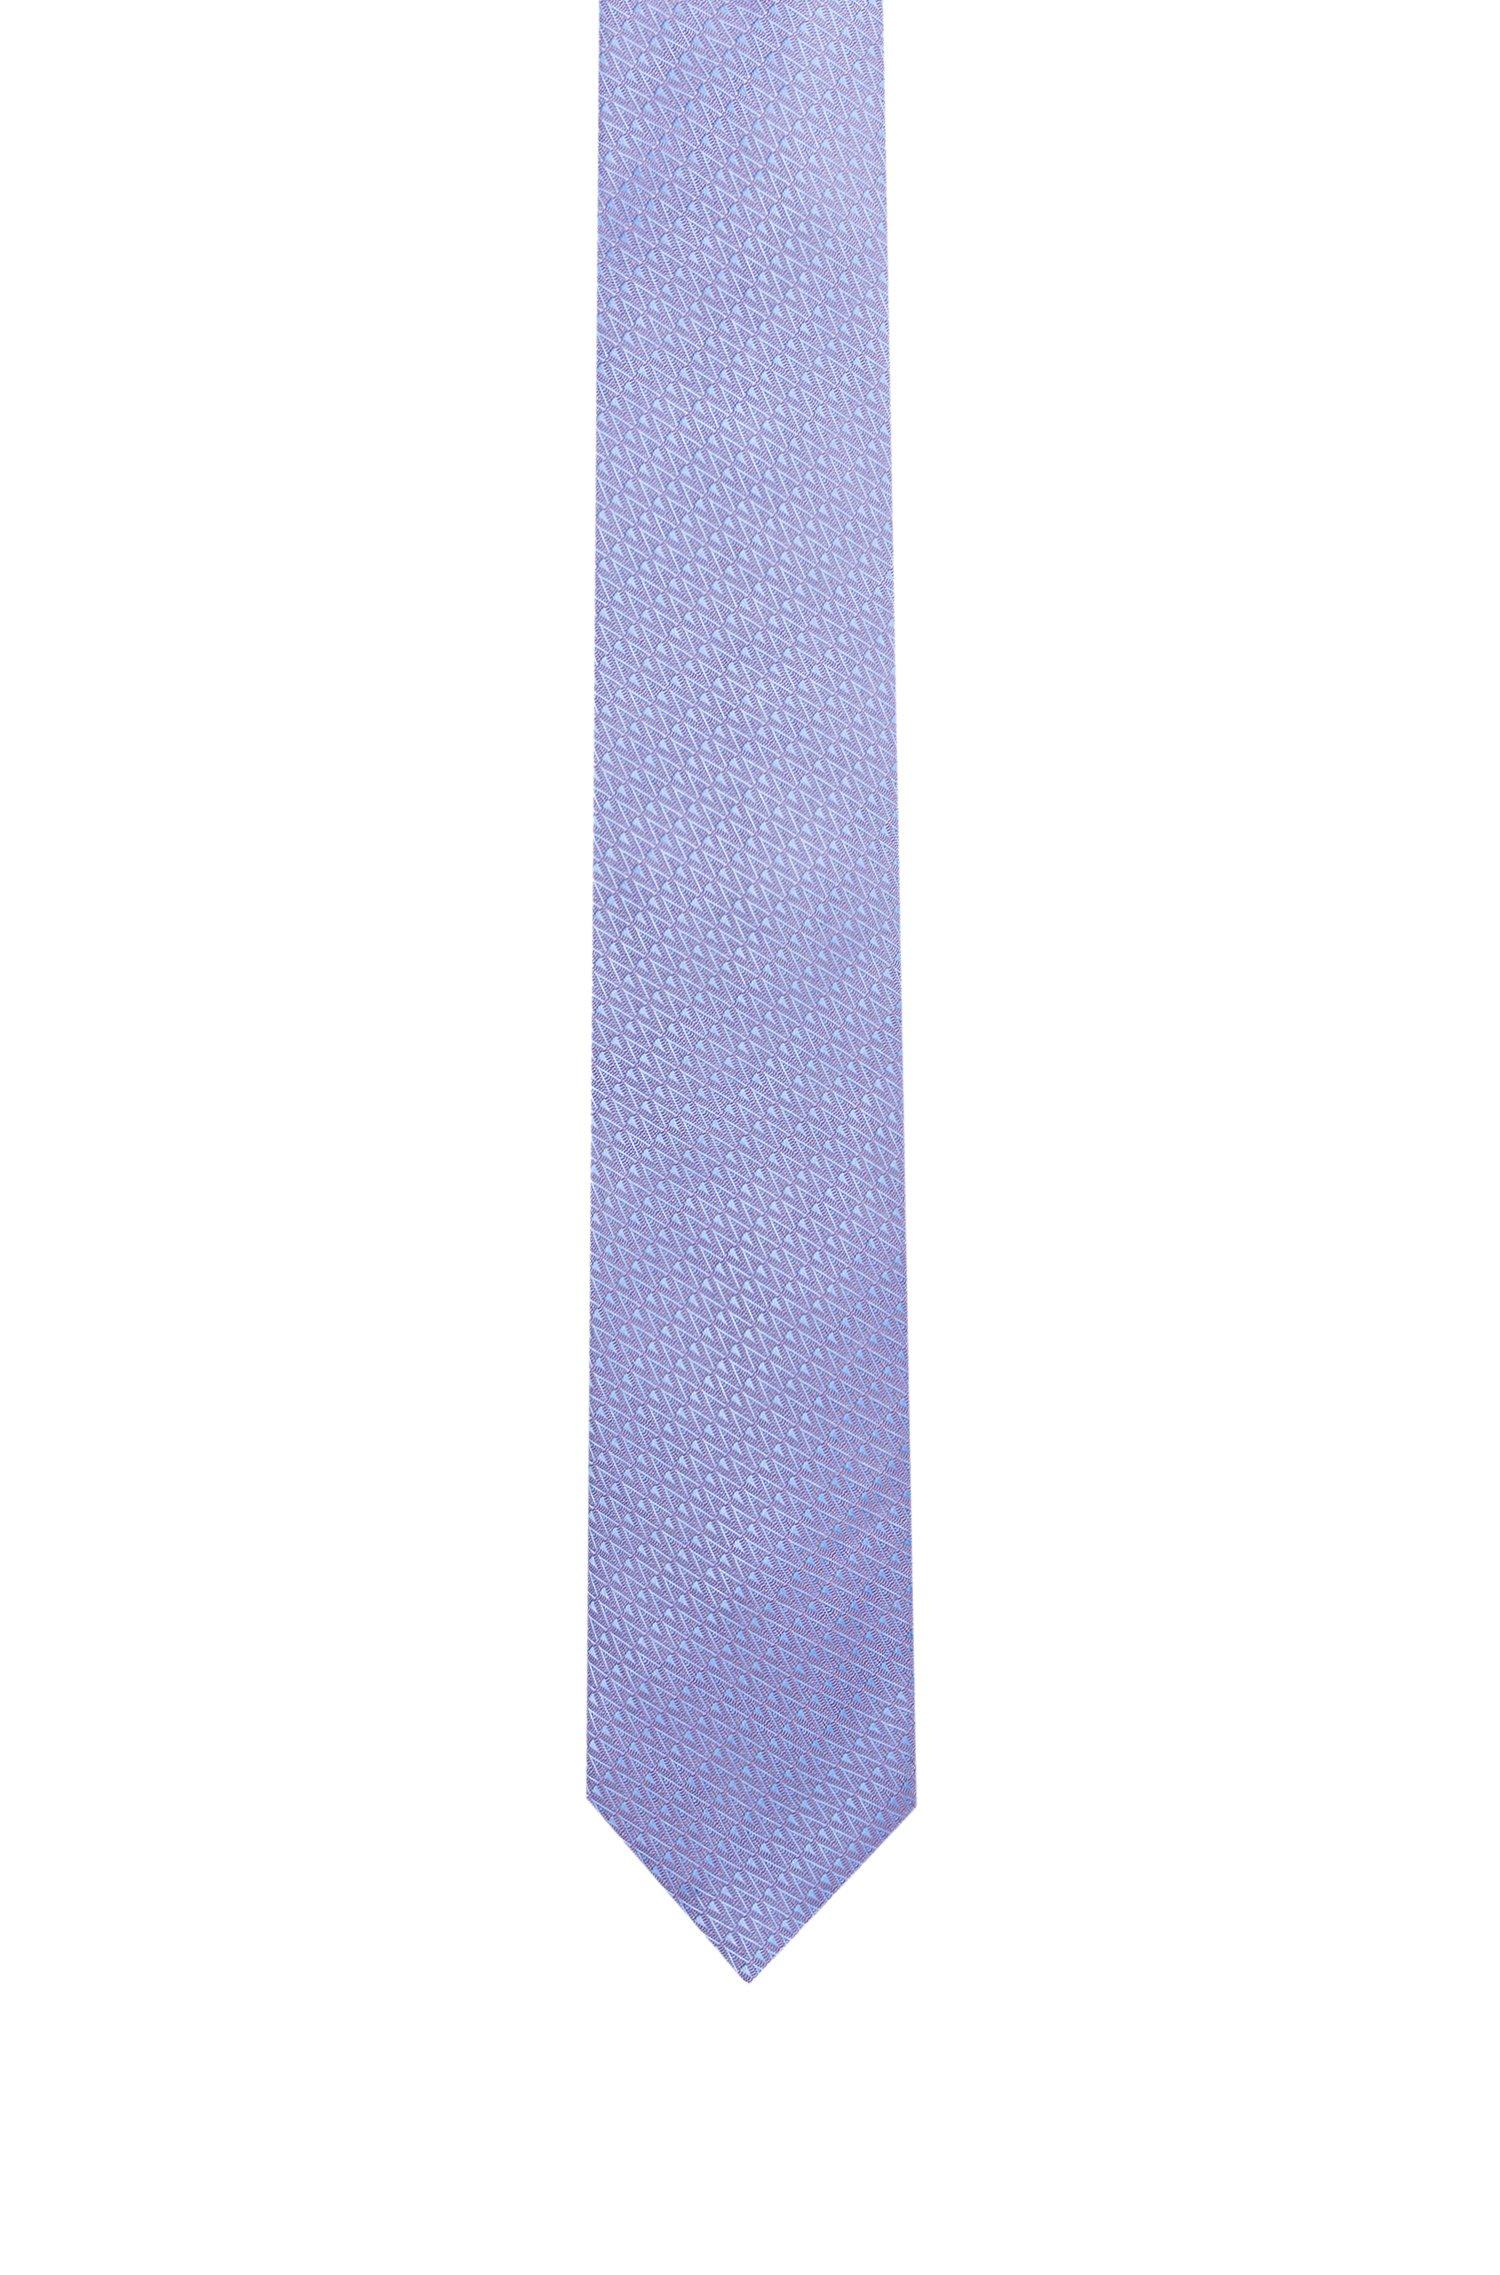 Zigzag-patterned tie in silk jacquard, Light Blue